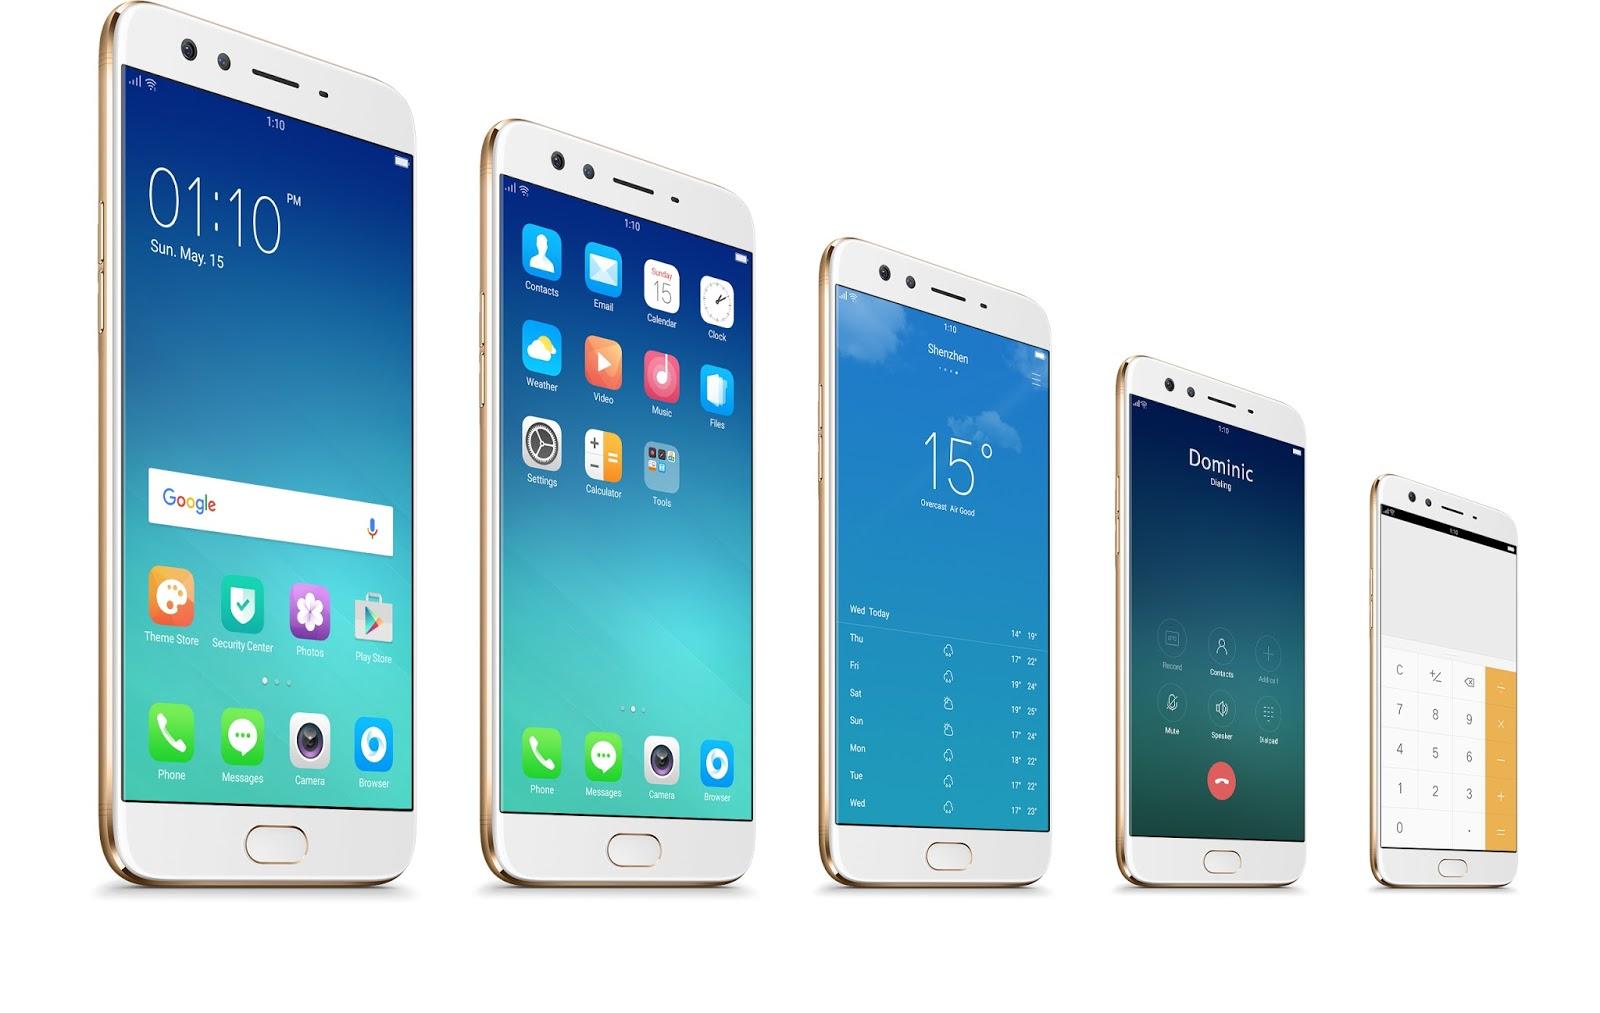 سعر ومواصفات Oppo F3 Plus الجديد بالصور